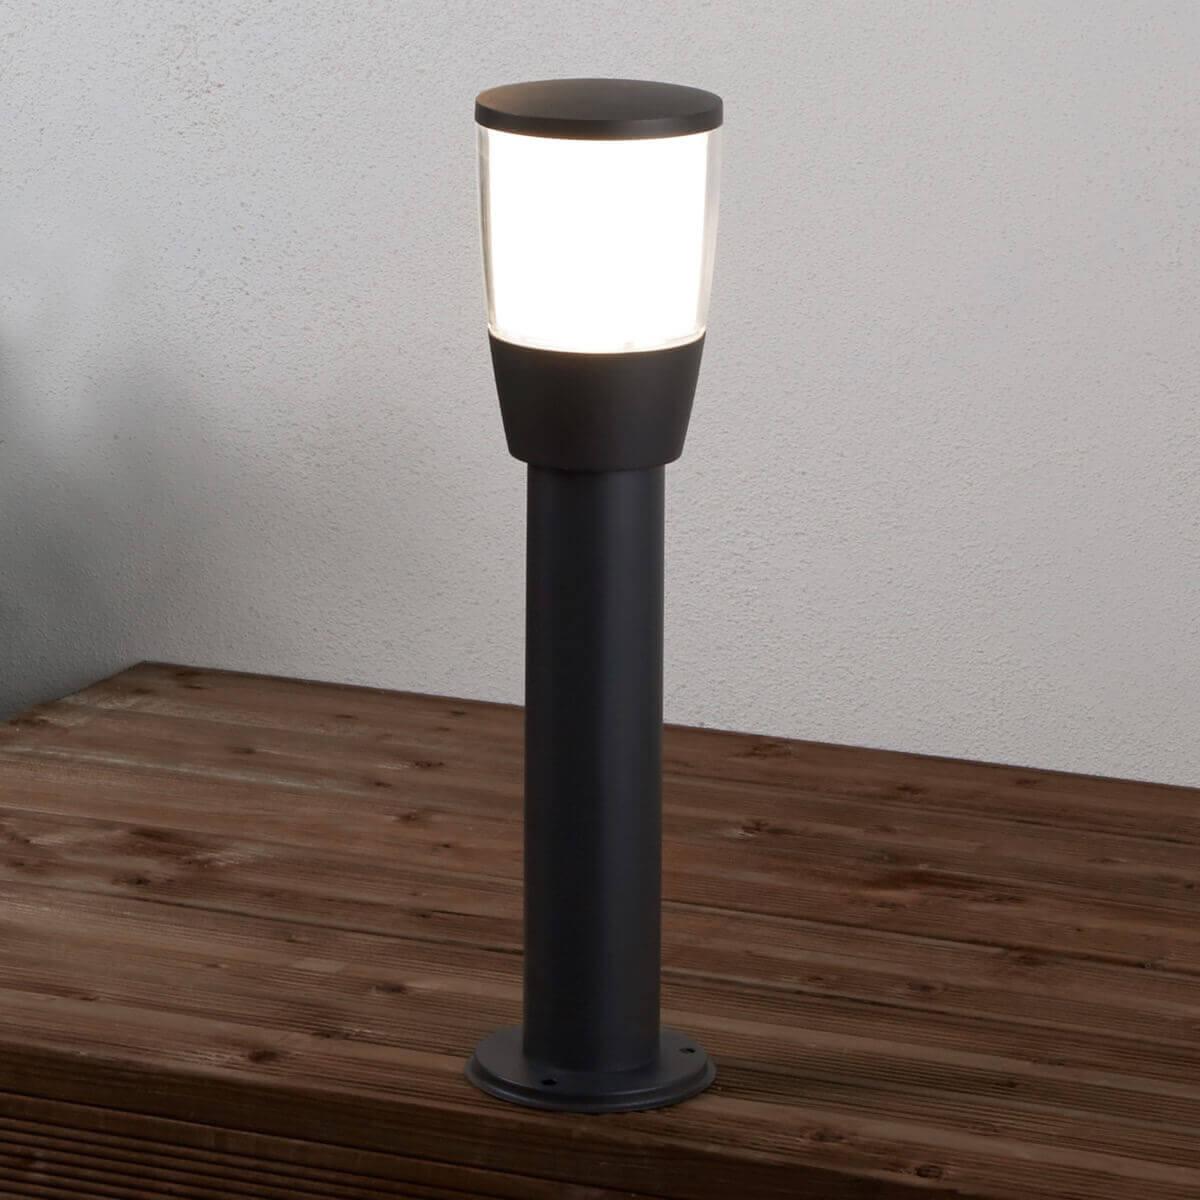 TUCSON OUTDOOR 1 LIGHT POST (45cm Height), DARK GREY